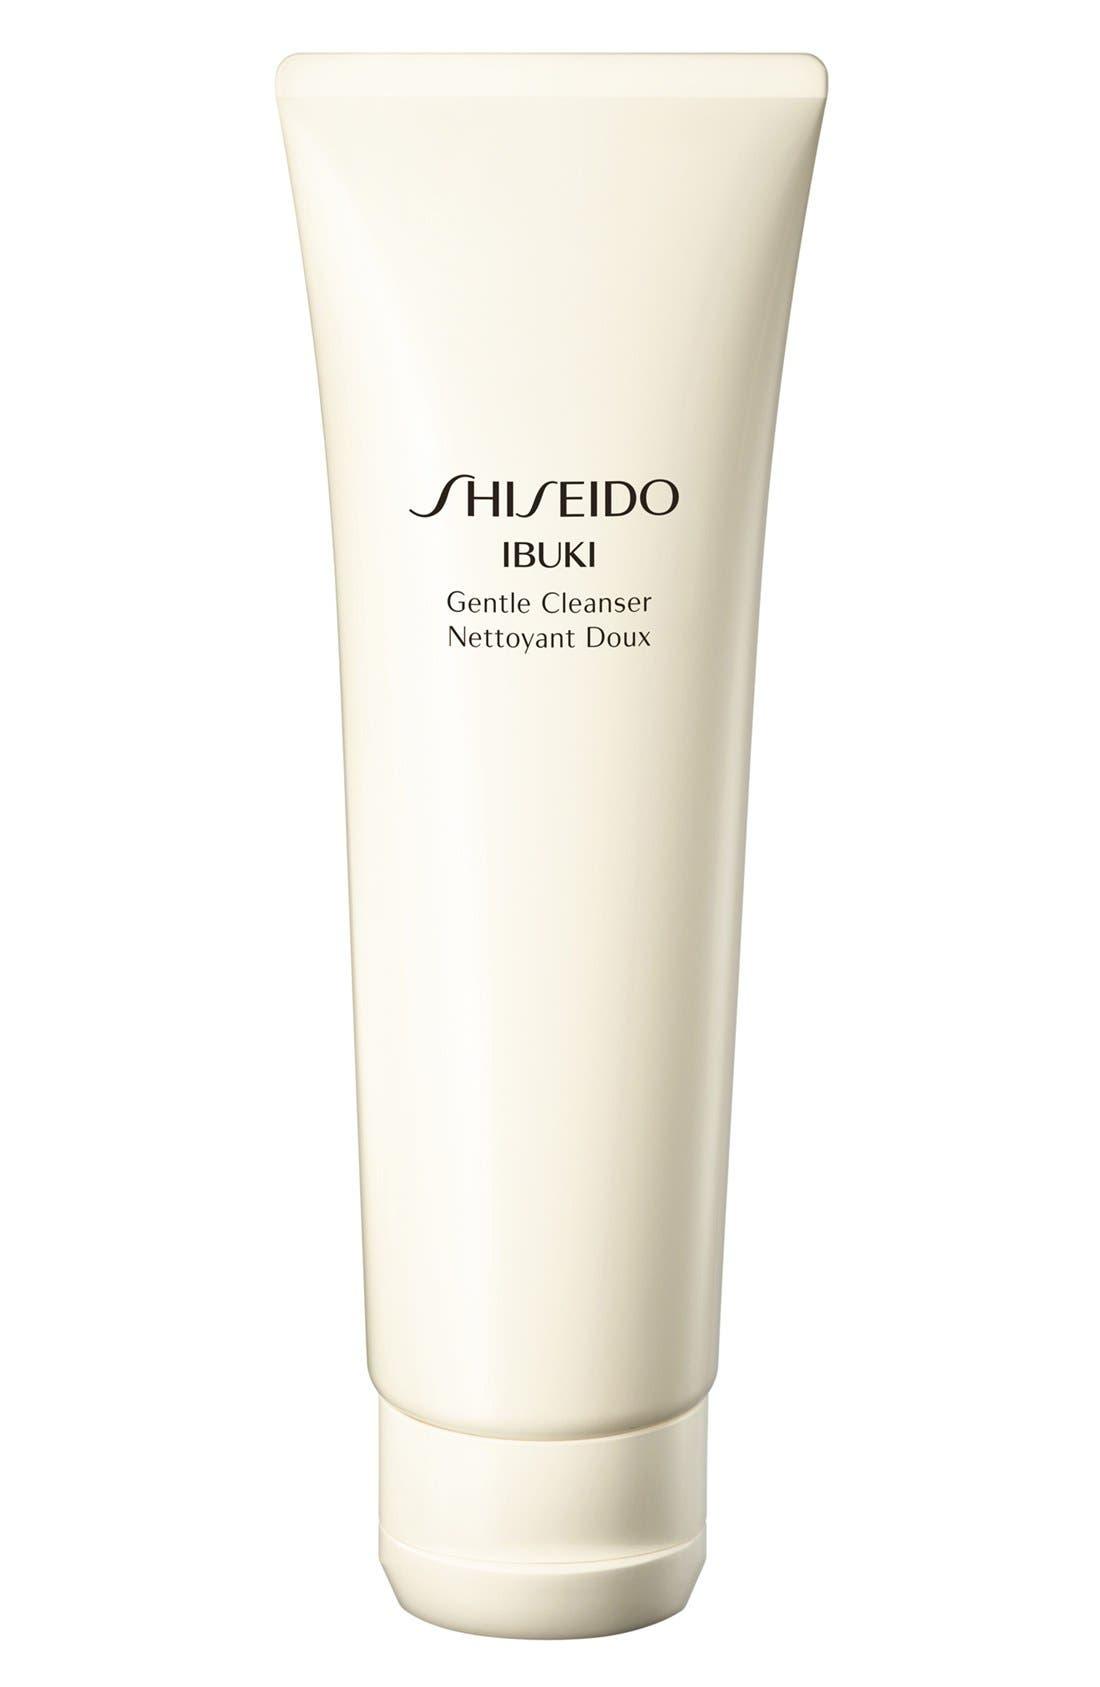 Shiseido 'Ibuki' Gentle Cleanser